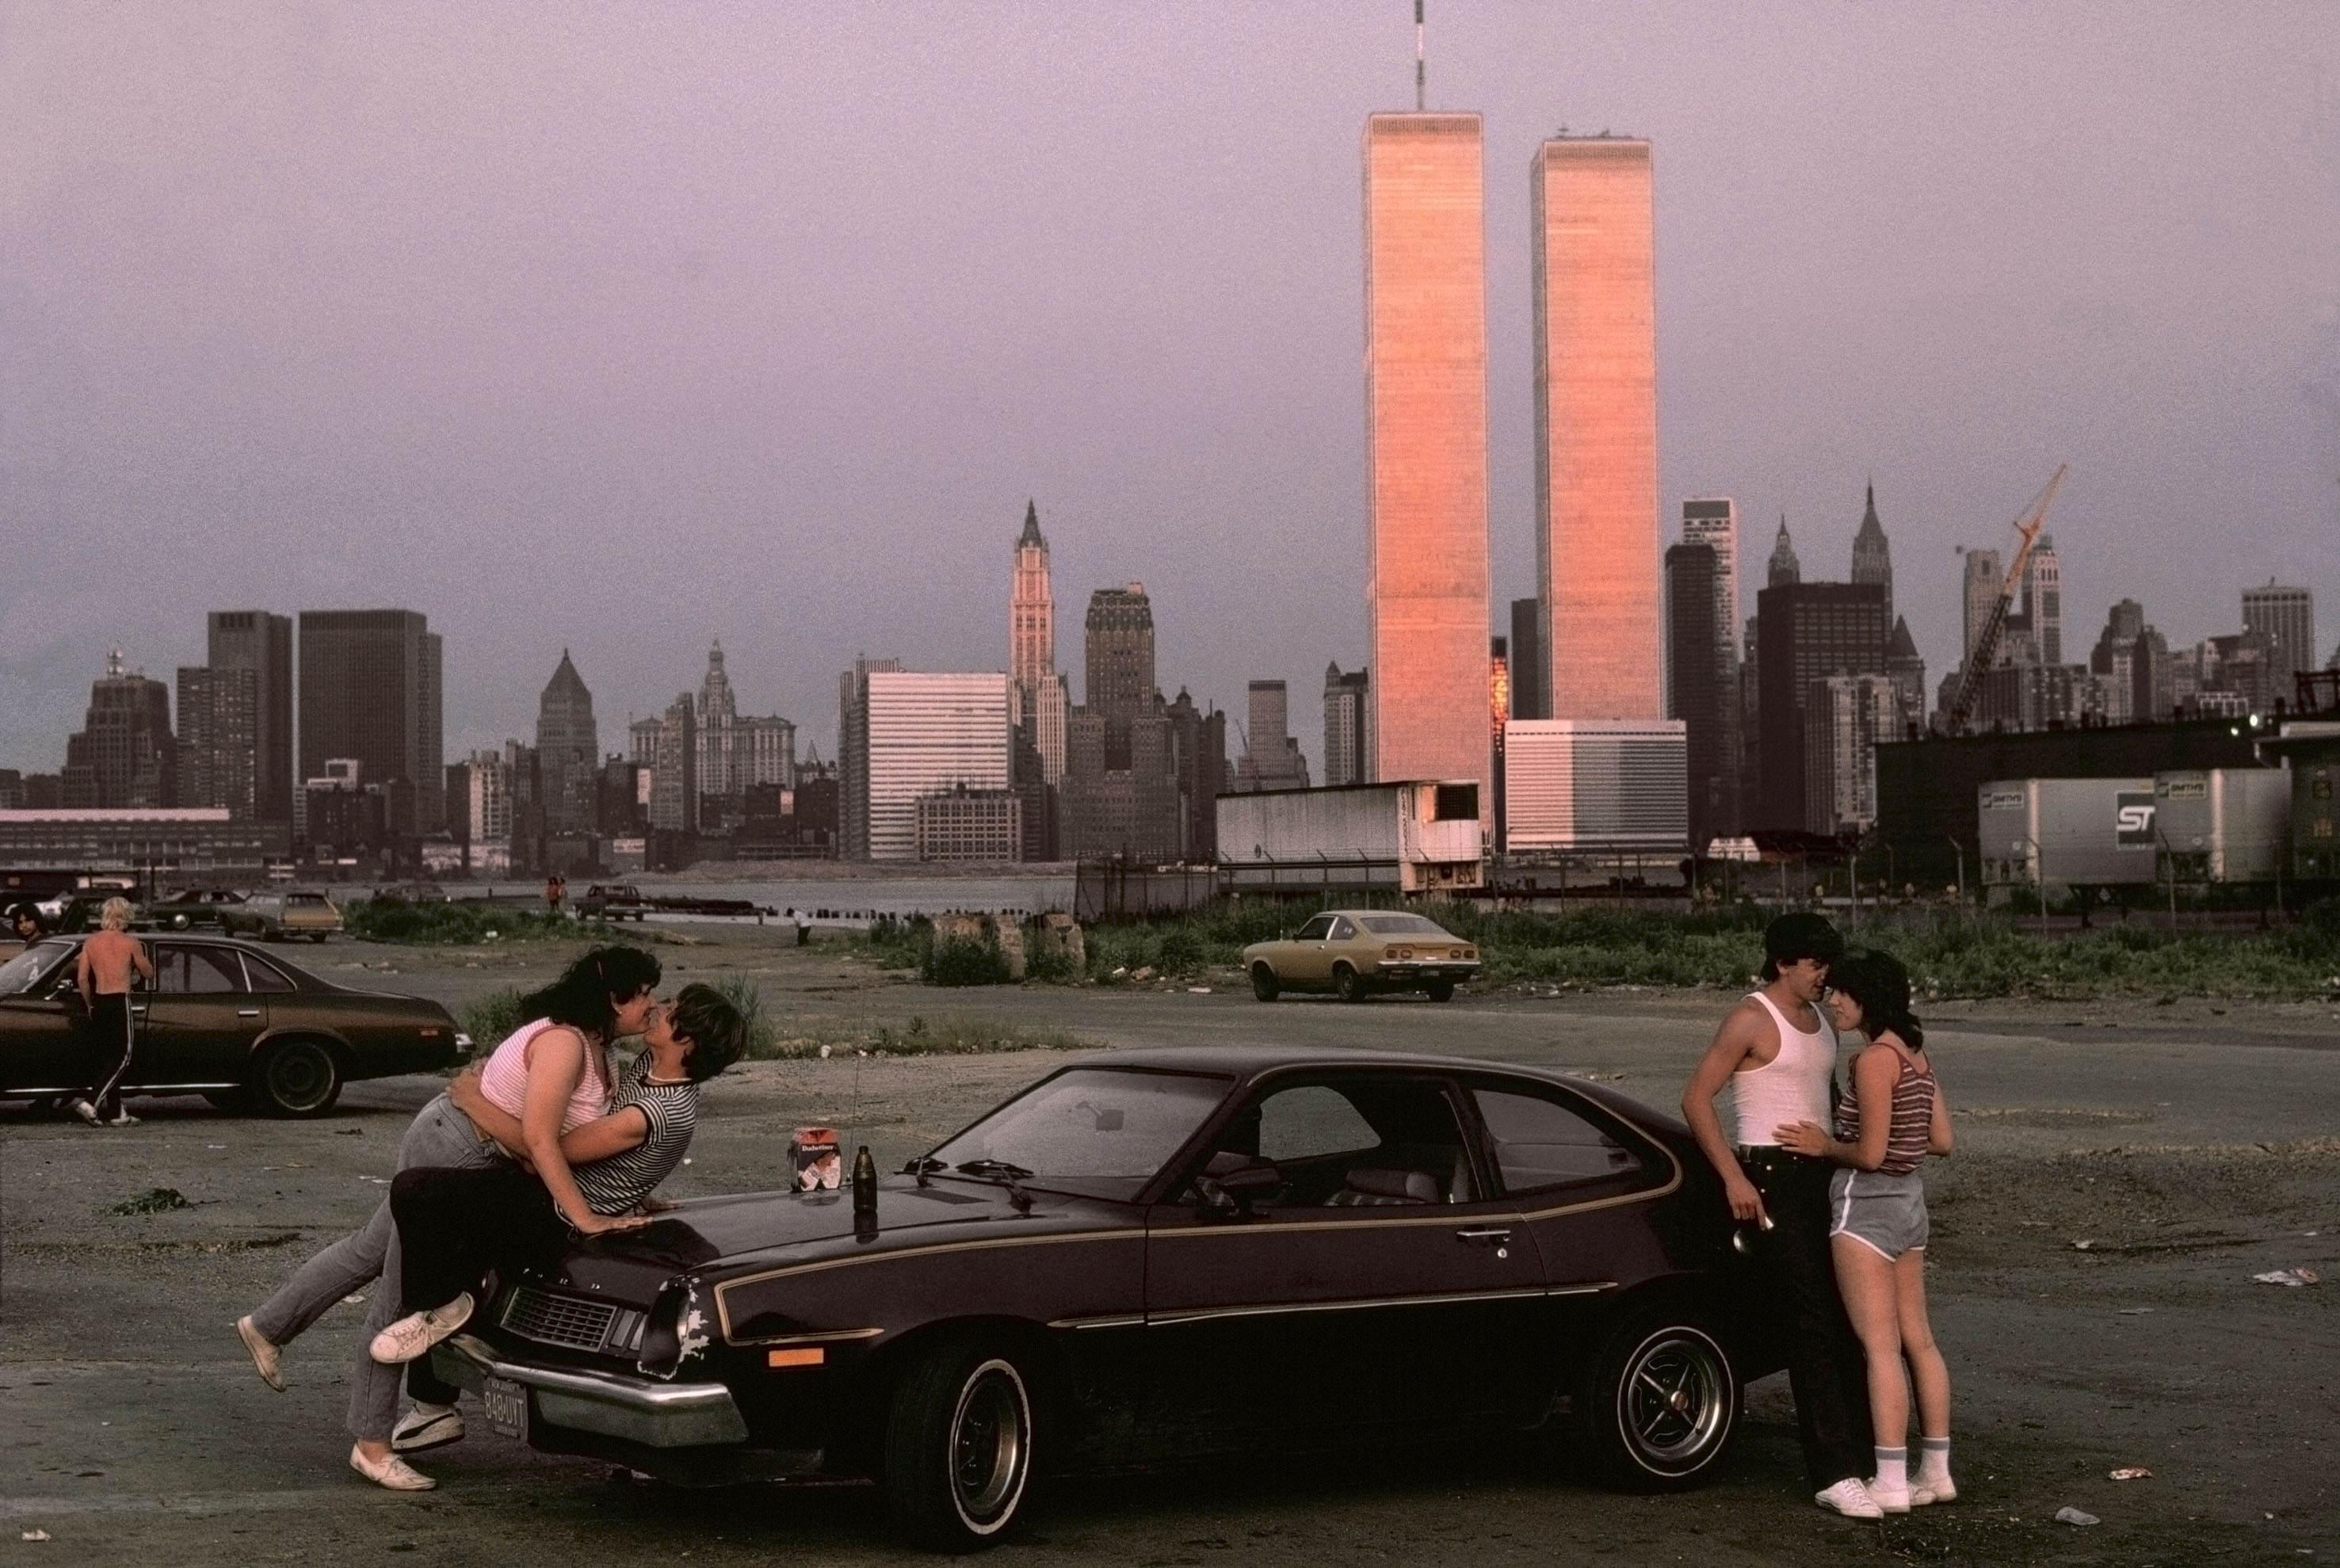 New Jersey, USA. 1983 © Thomas Hoepker/Magnum Photos